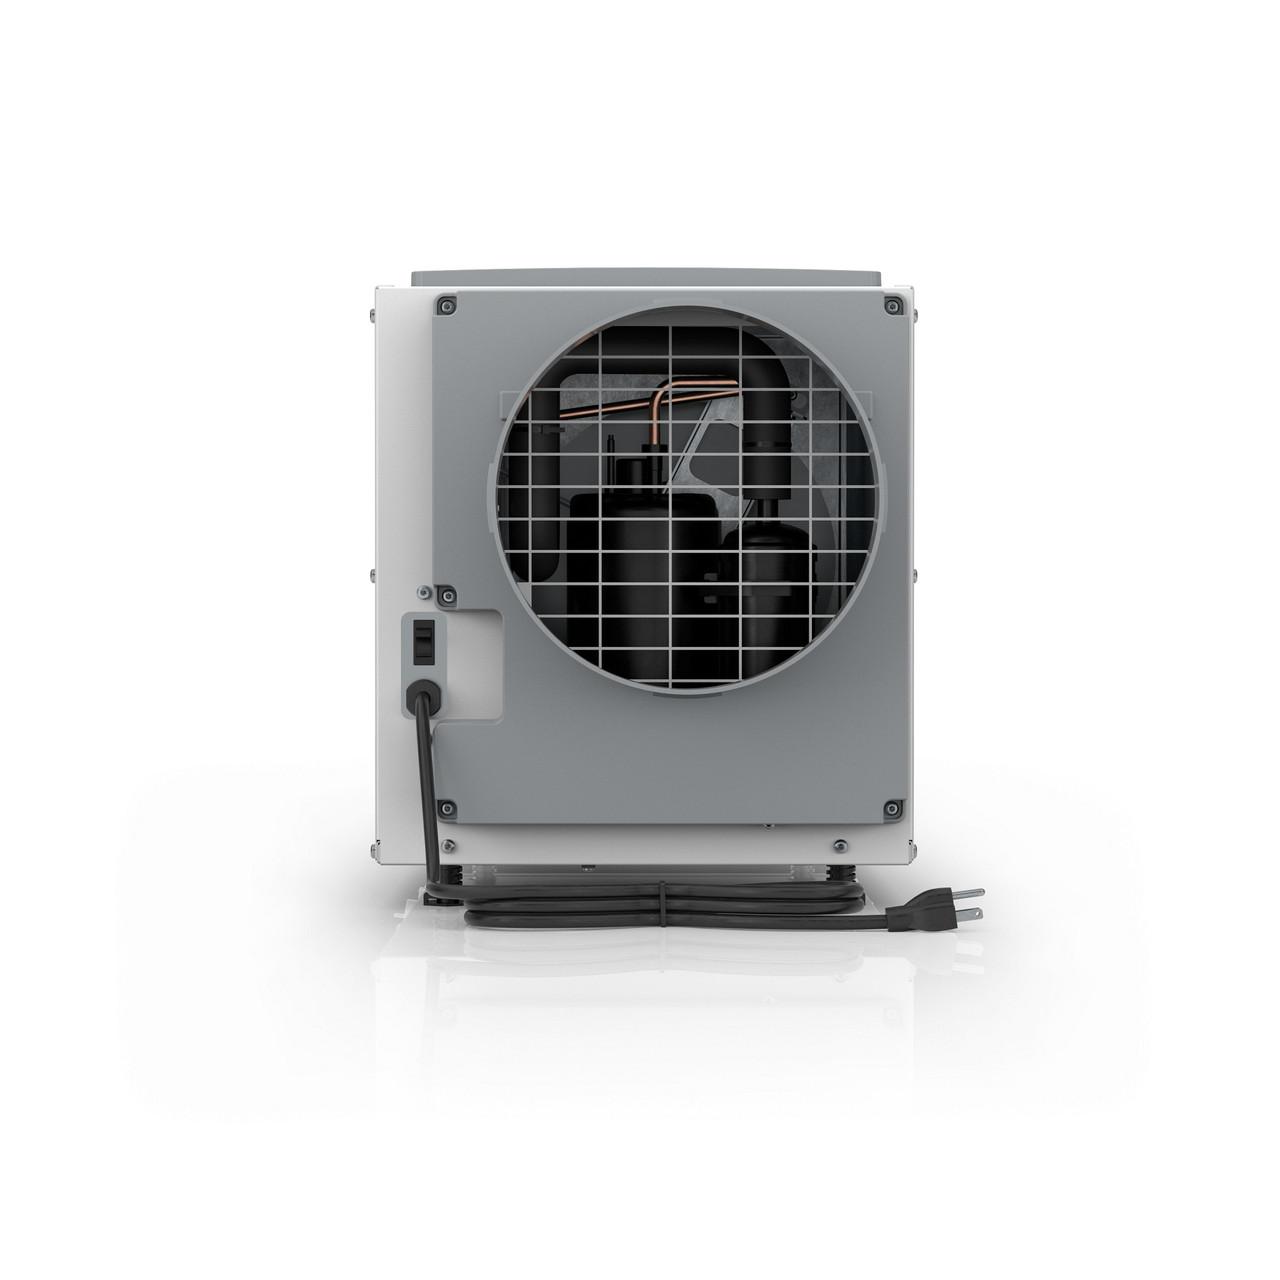 Aprilaire Model E100 Dehumidifier Supply View